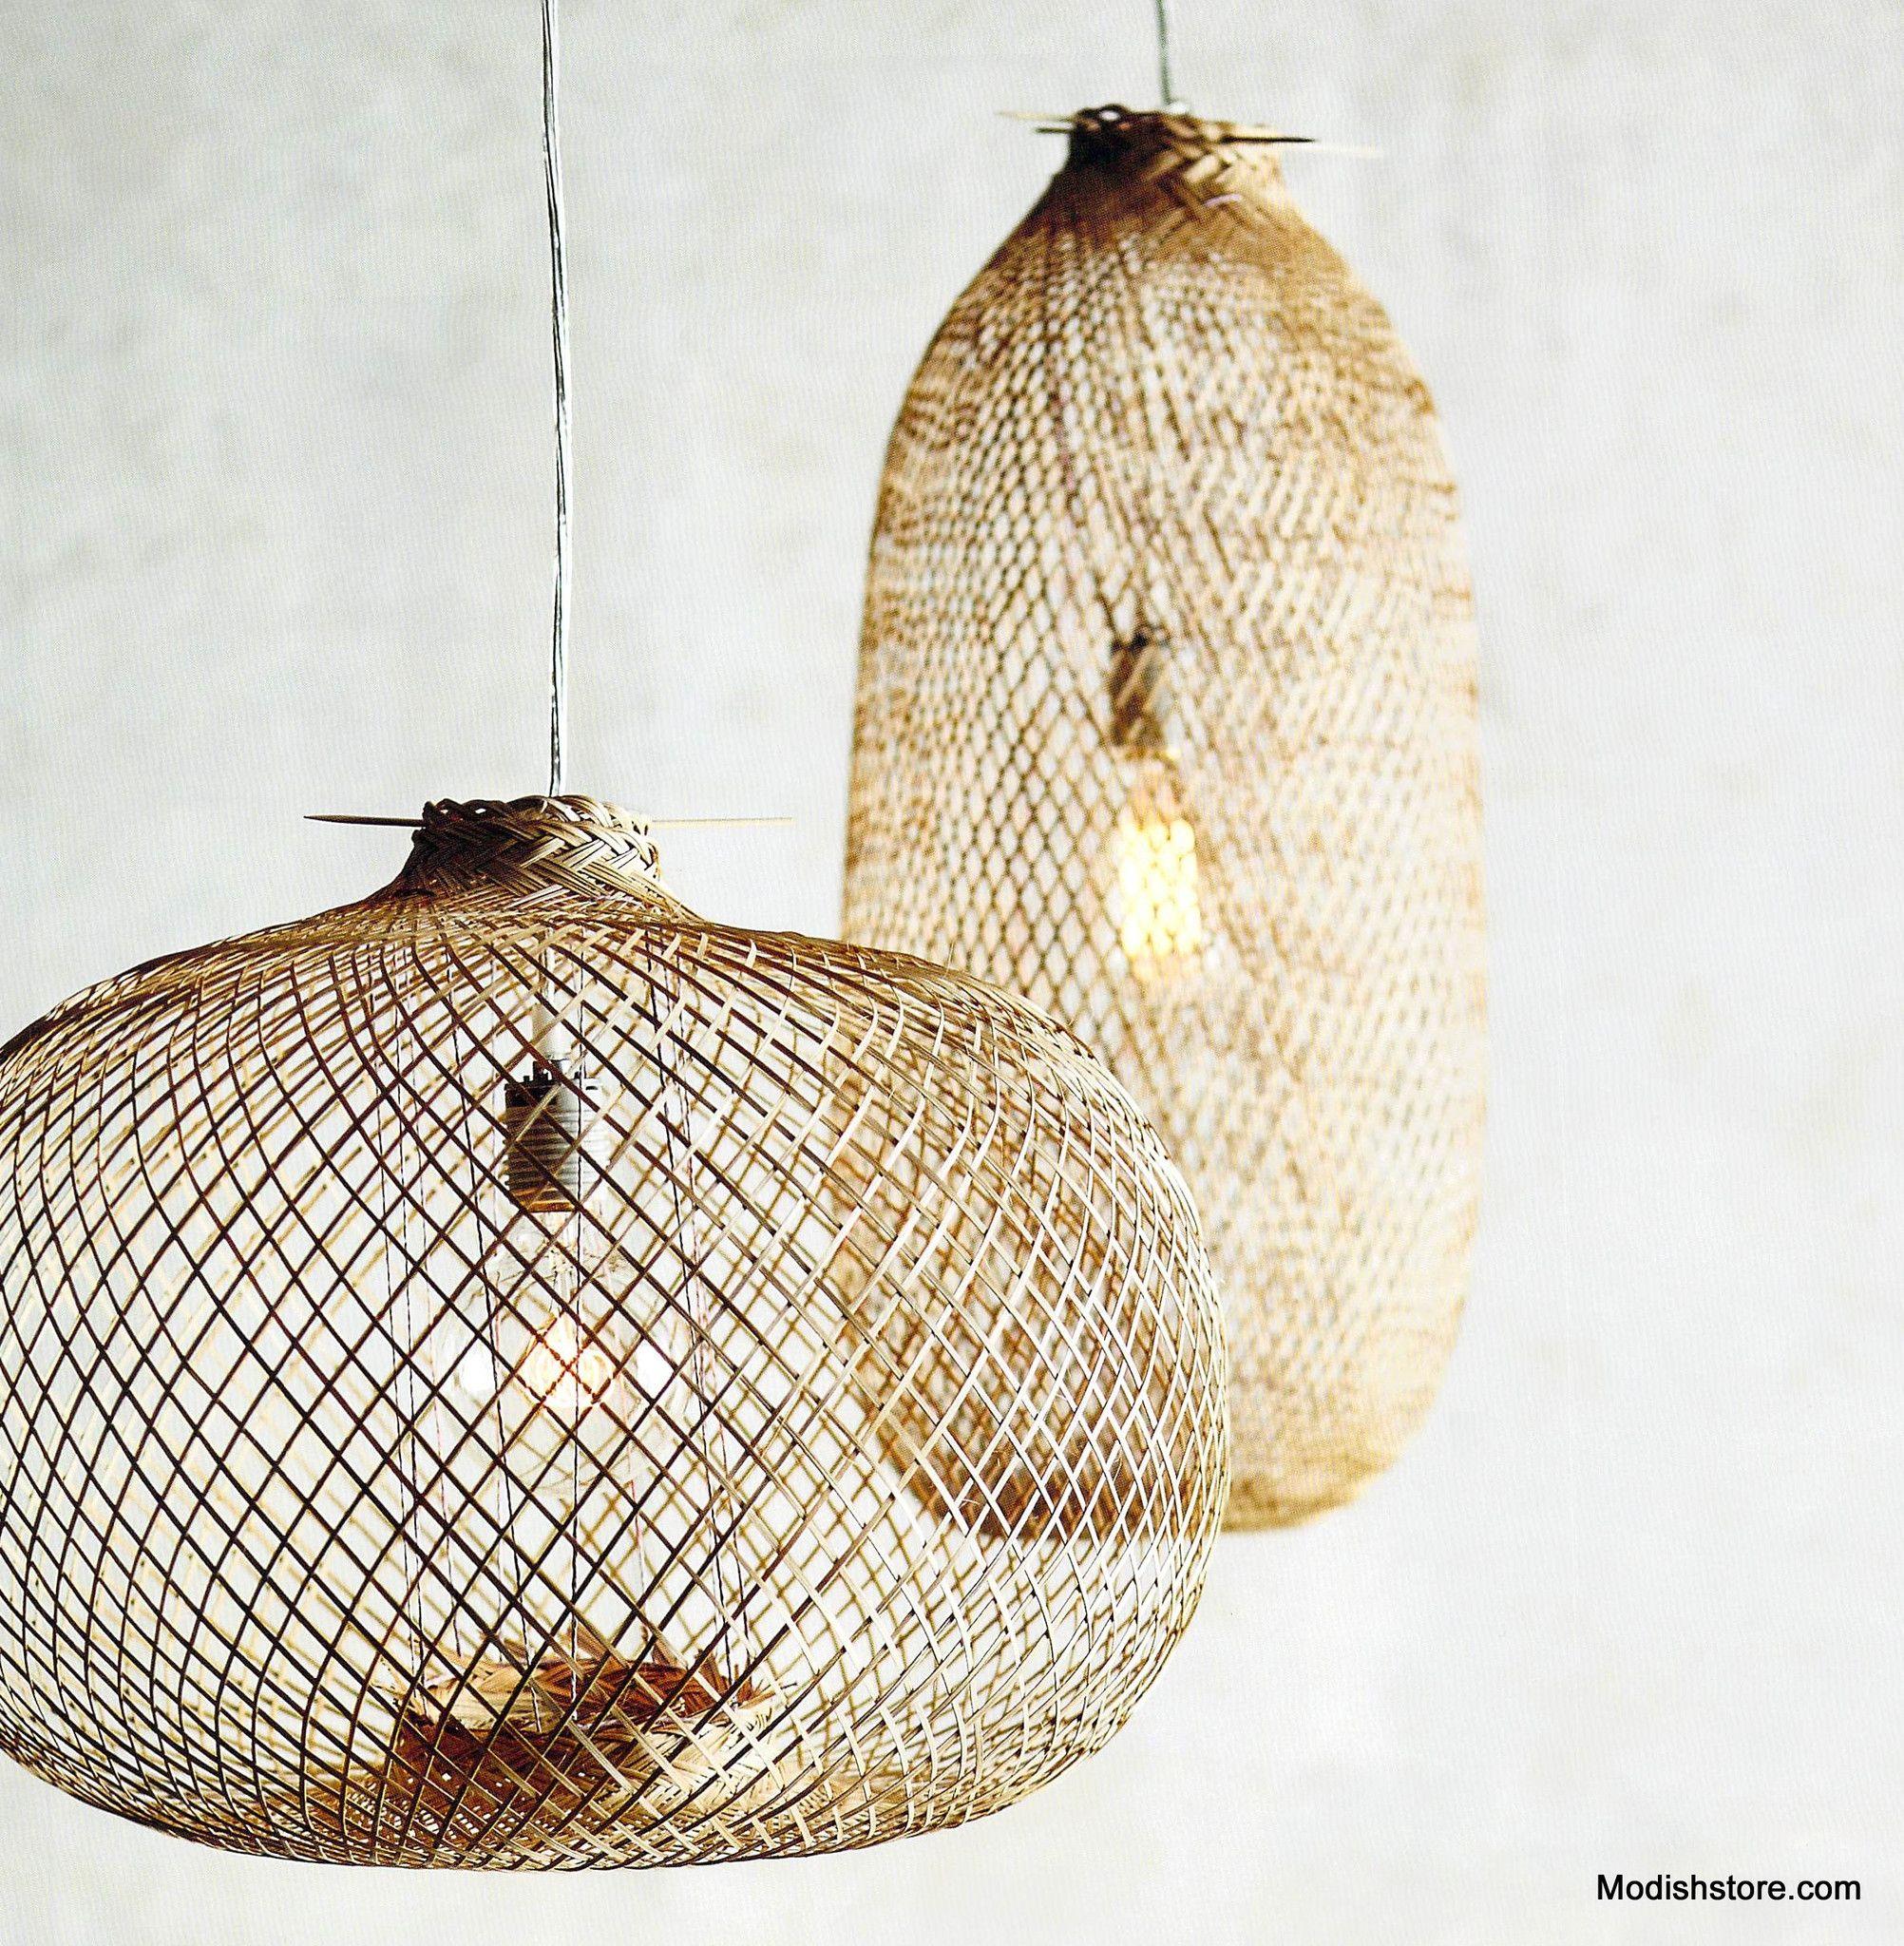 Lumina Bamboo Handwoven Pendant Lamps - Round & Oblong ...